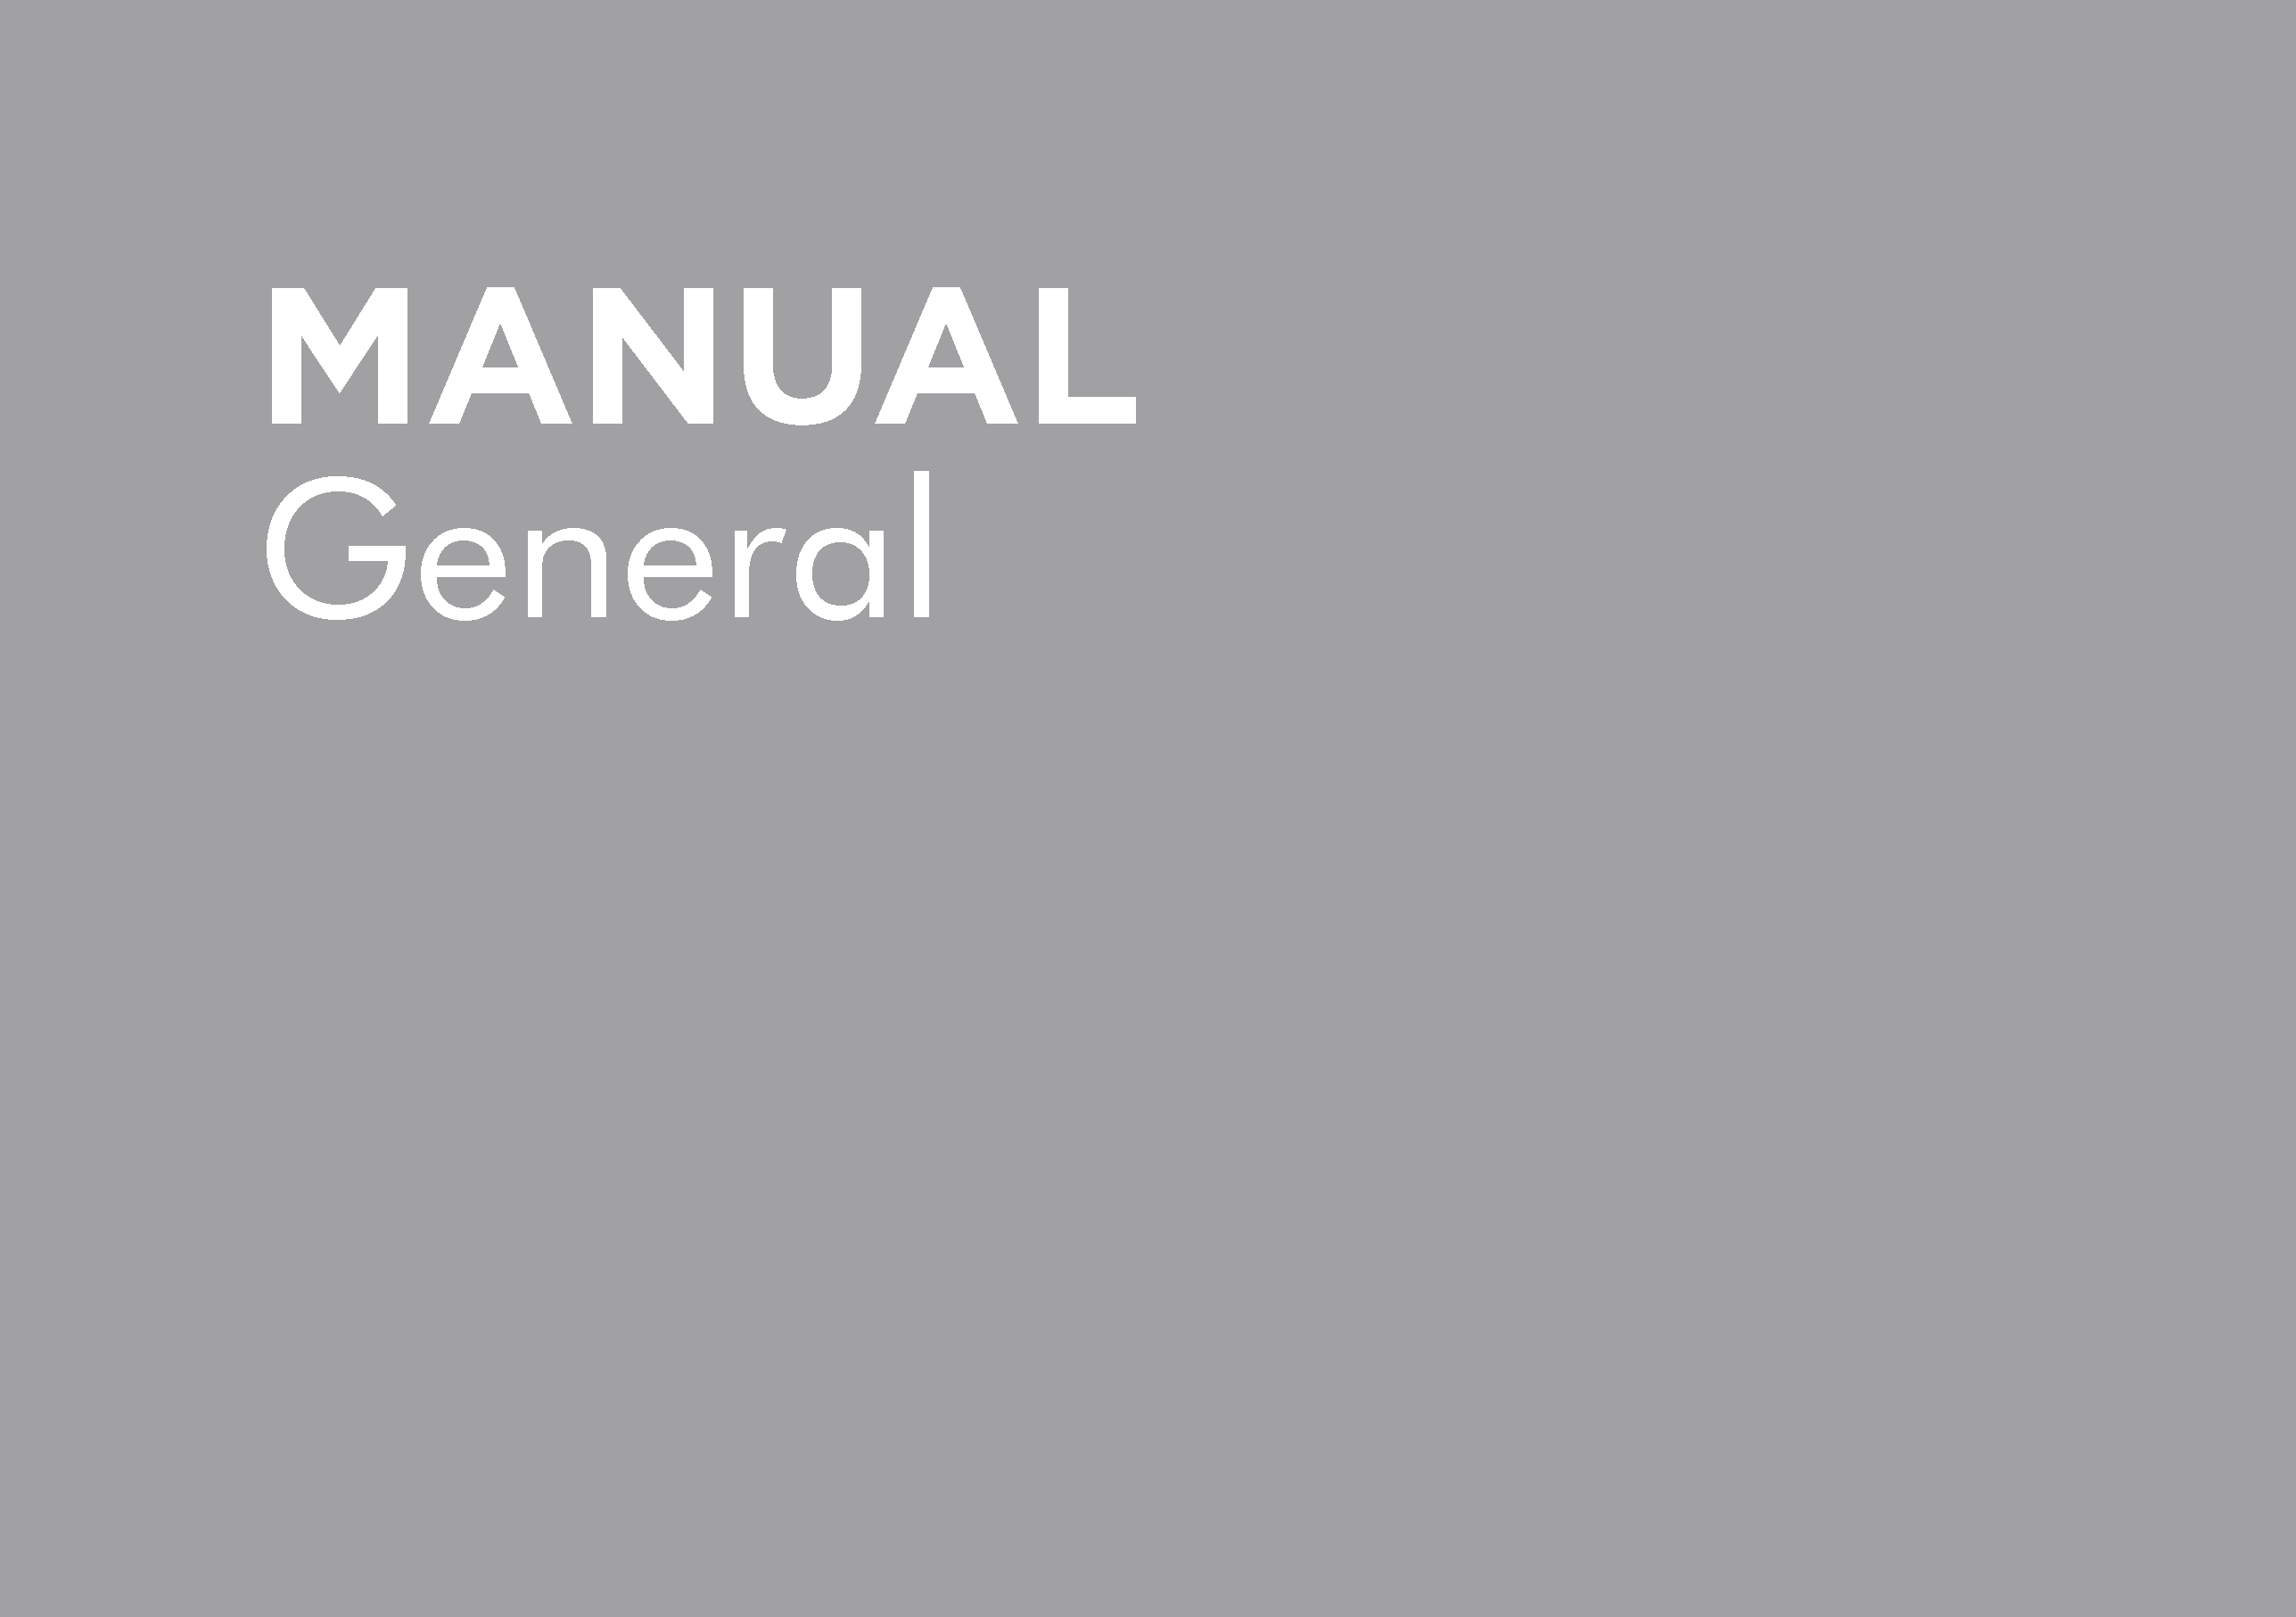 GP-POM001108 – GENERAL SPRAYER OPERATIONS UPDATE 1